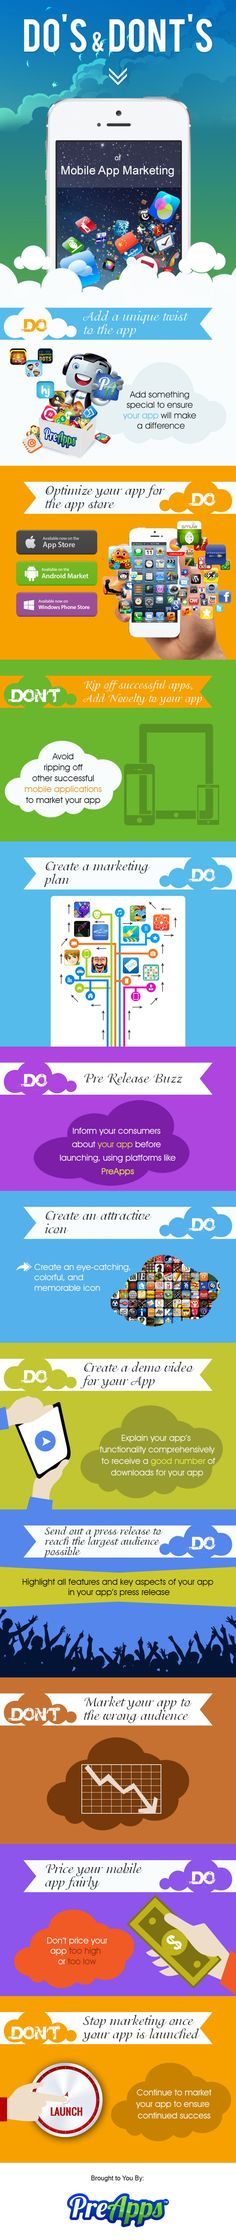 Do's & Dont's of #Mobile #App #Marketing